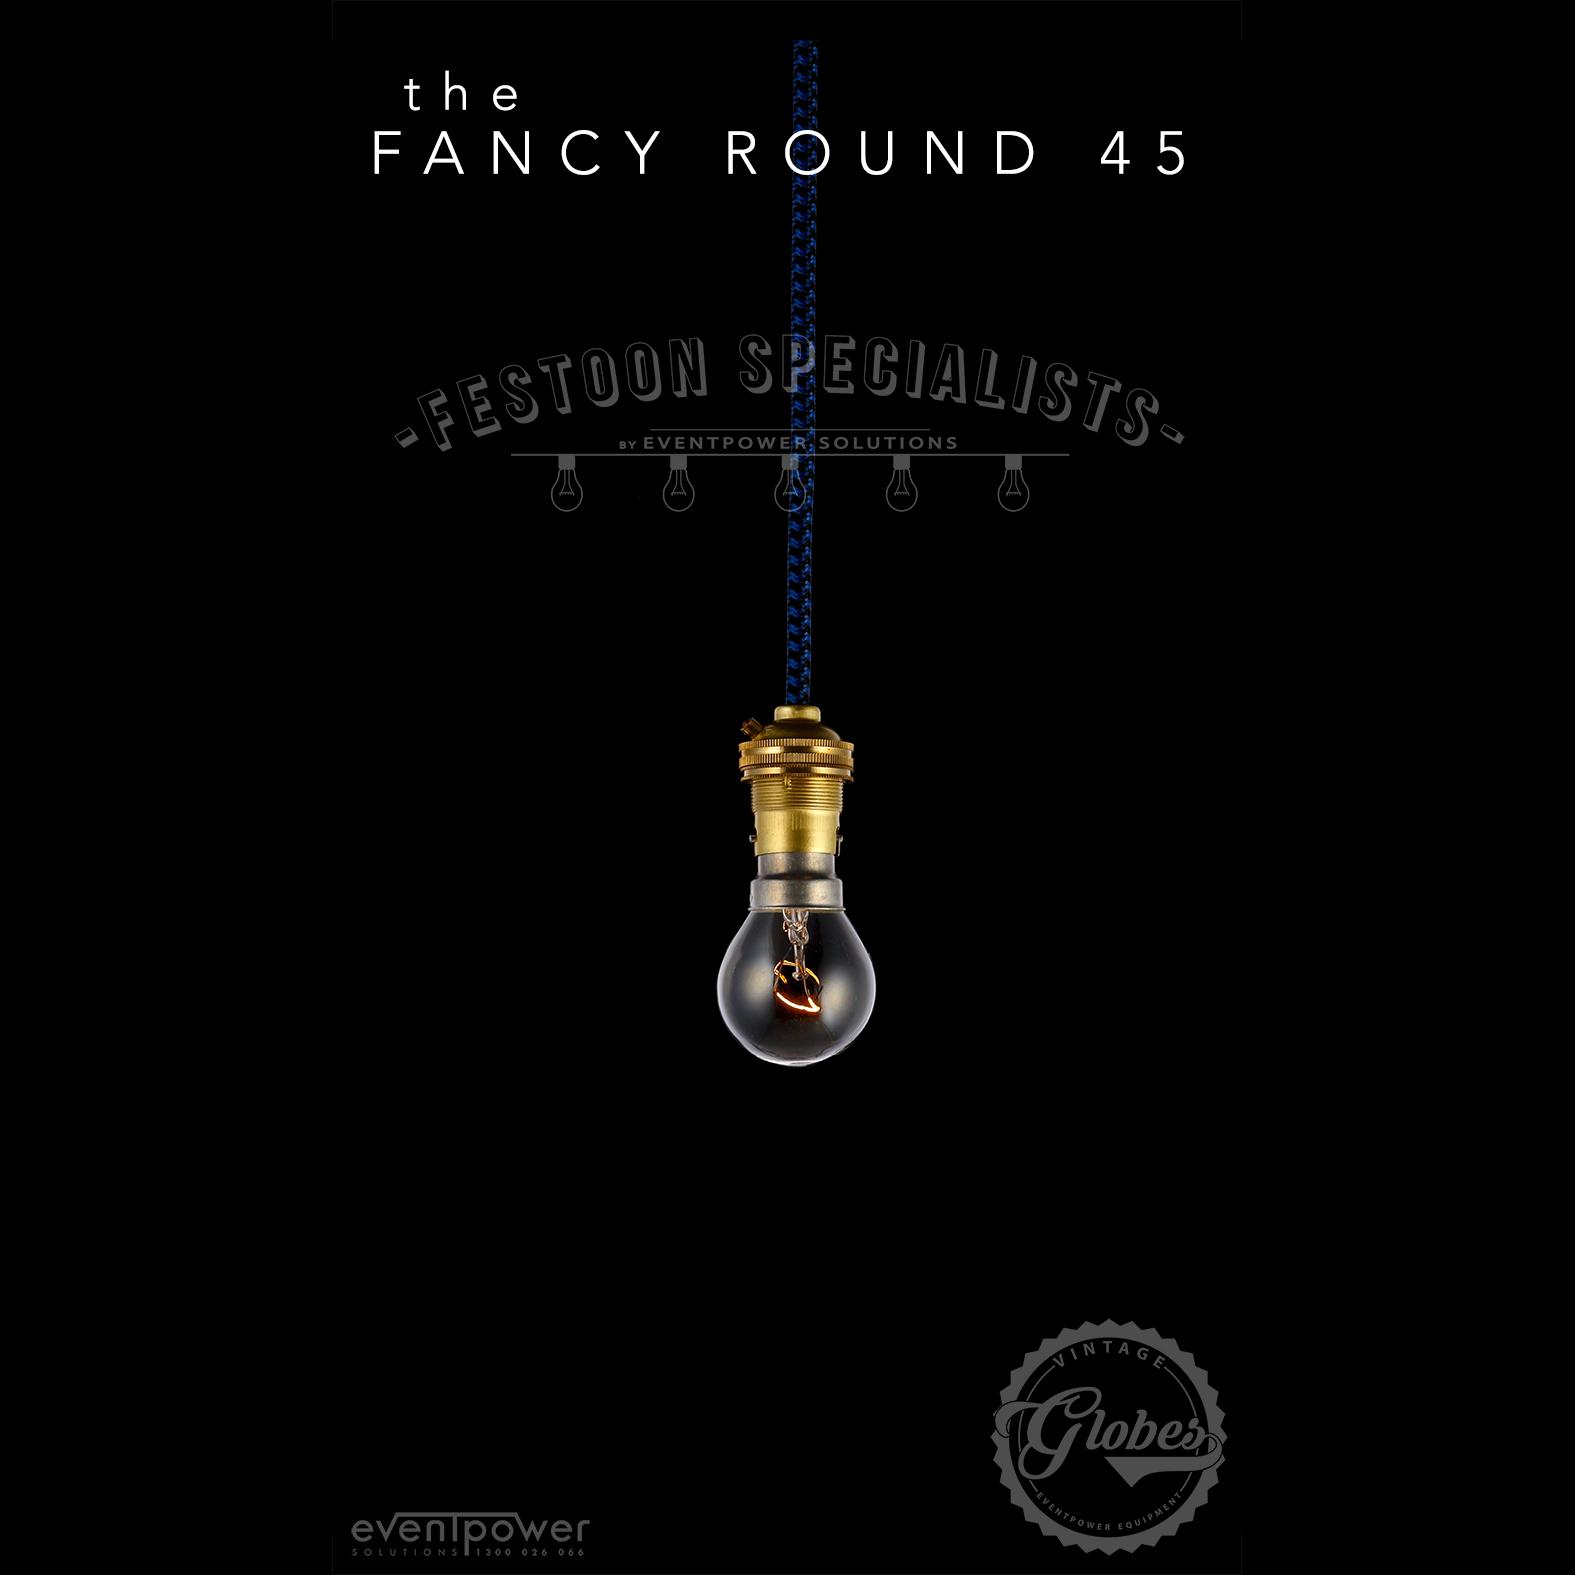 Festoon_Specialists-Fancy_Round_45mm.jpg